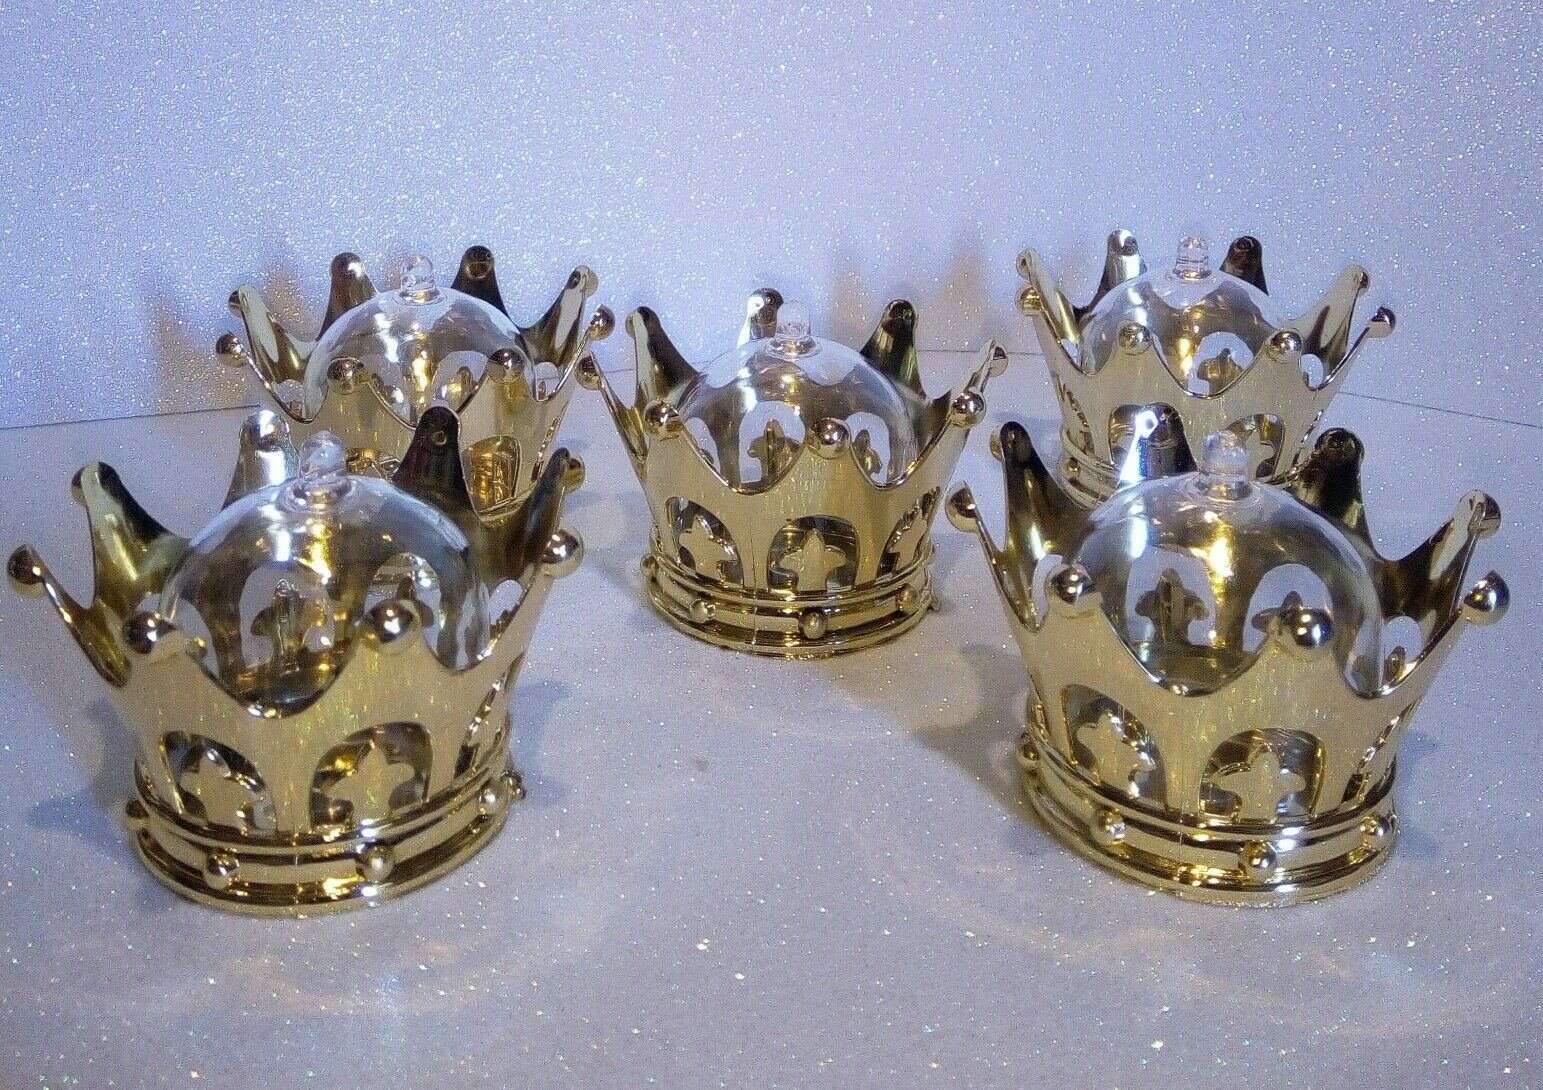 250pcs Gold Crown Dome, Decor Favor Box keepsake Baby shower, Wedding, Birthday